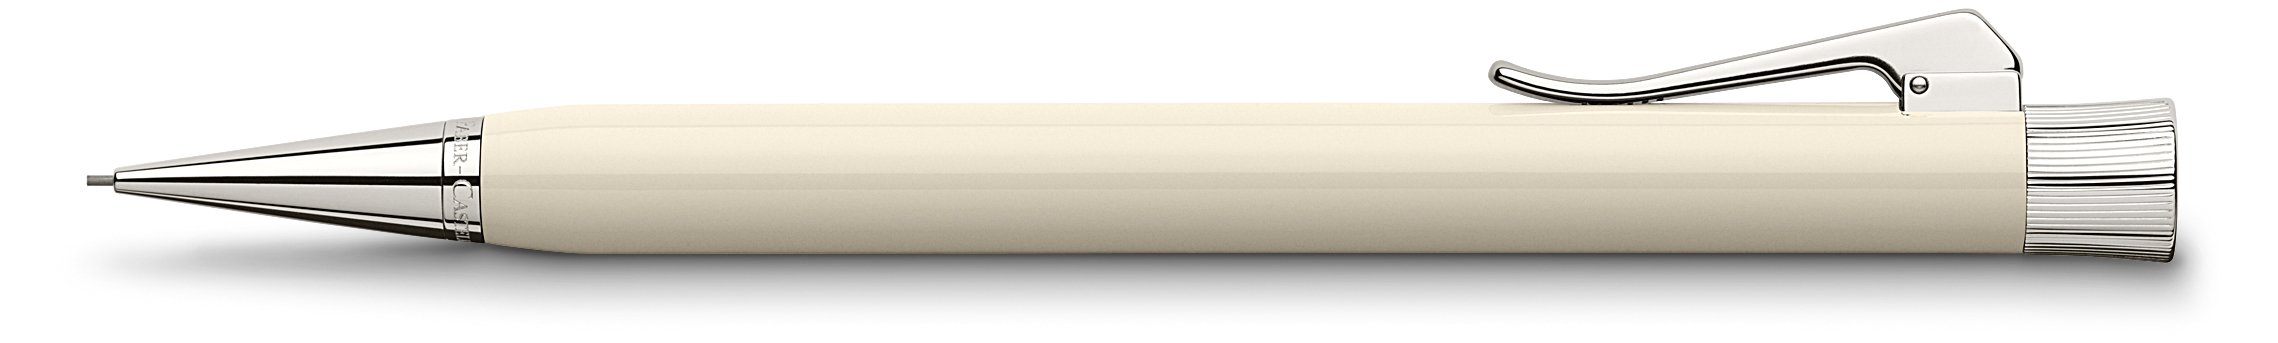 Graf von Faber-Castell Intuition Mechanical pencil, Precious resine, Ivory